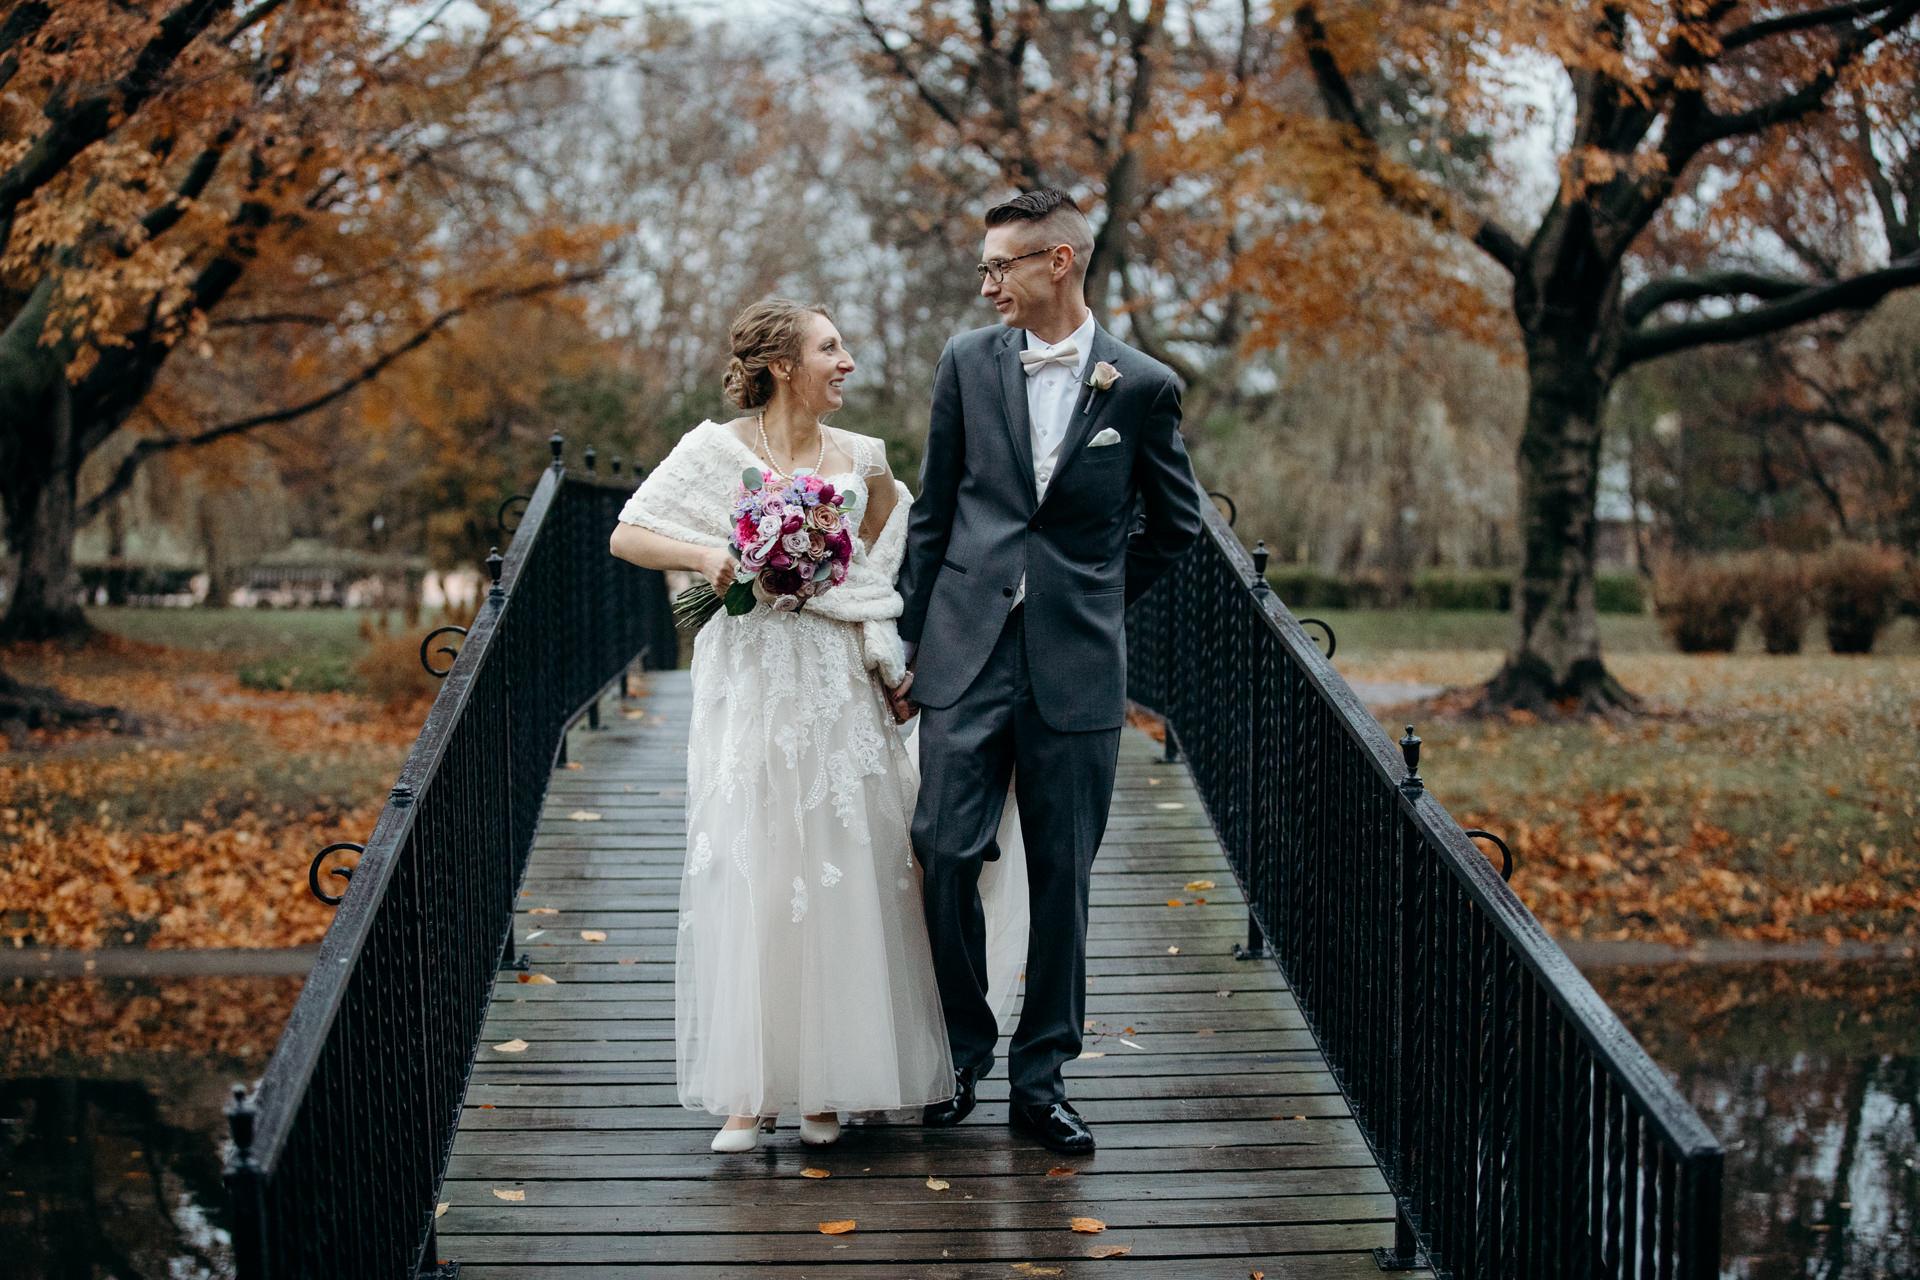 Armory wedding south bend grant beachy photography elkhart goshen -058.jpg